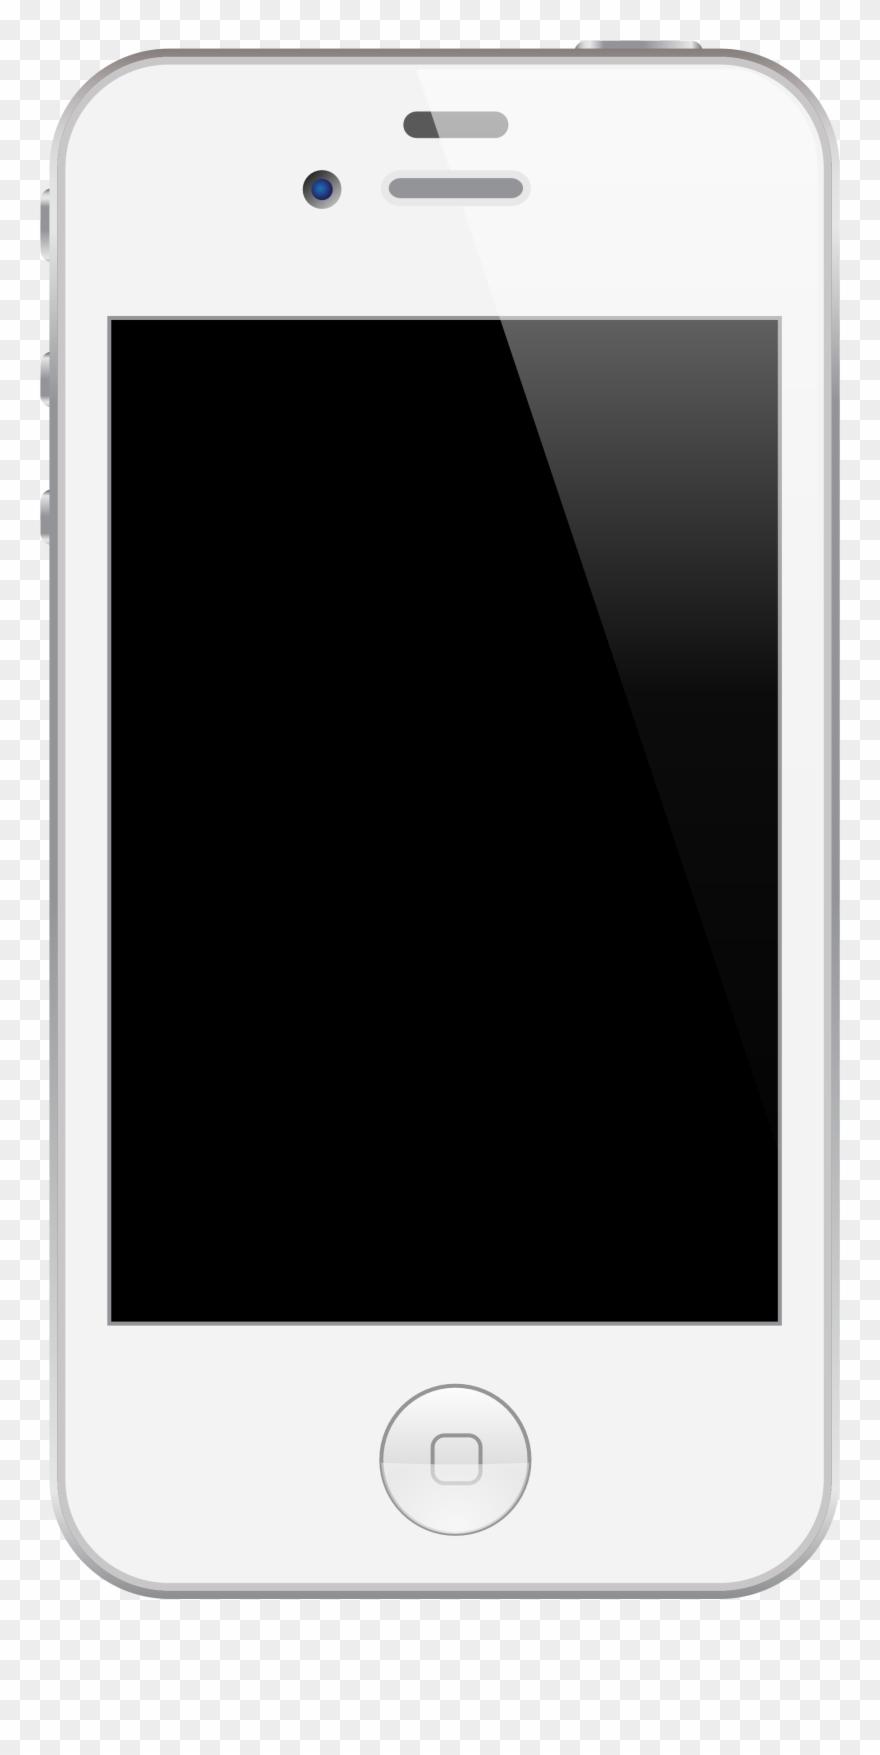 Iphone4 20111028 Phone Icon Iphone Art 1979px 119 Iphone 7